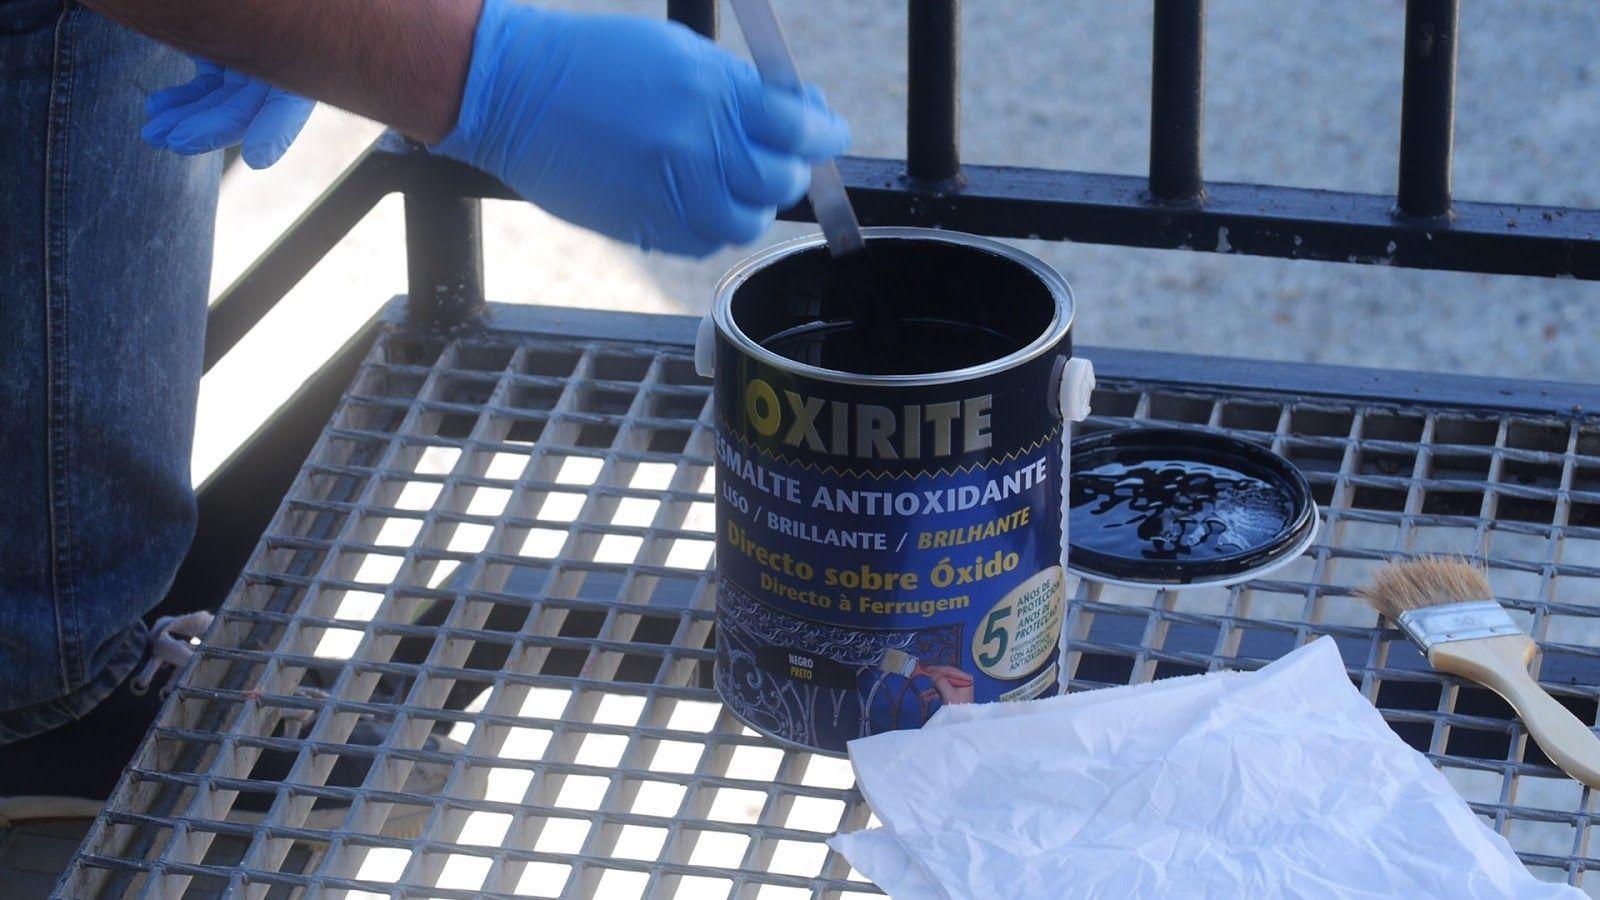 Remover la pintura antigoteo correctamente